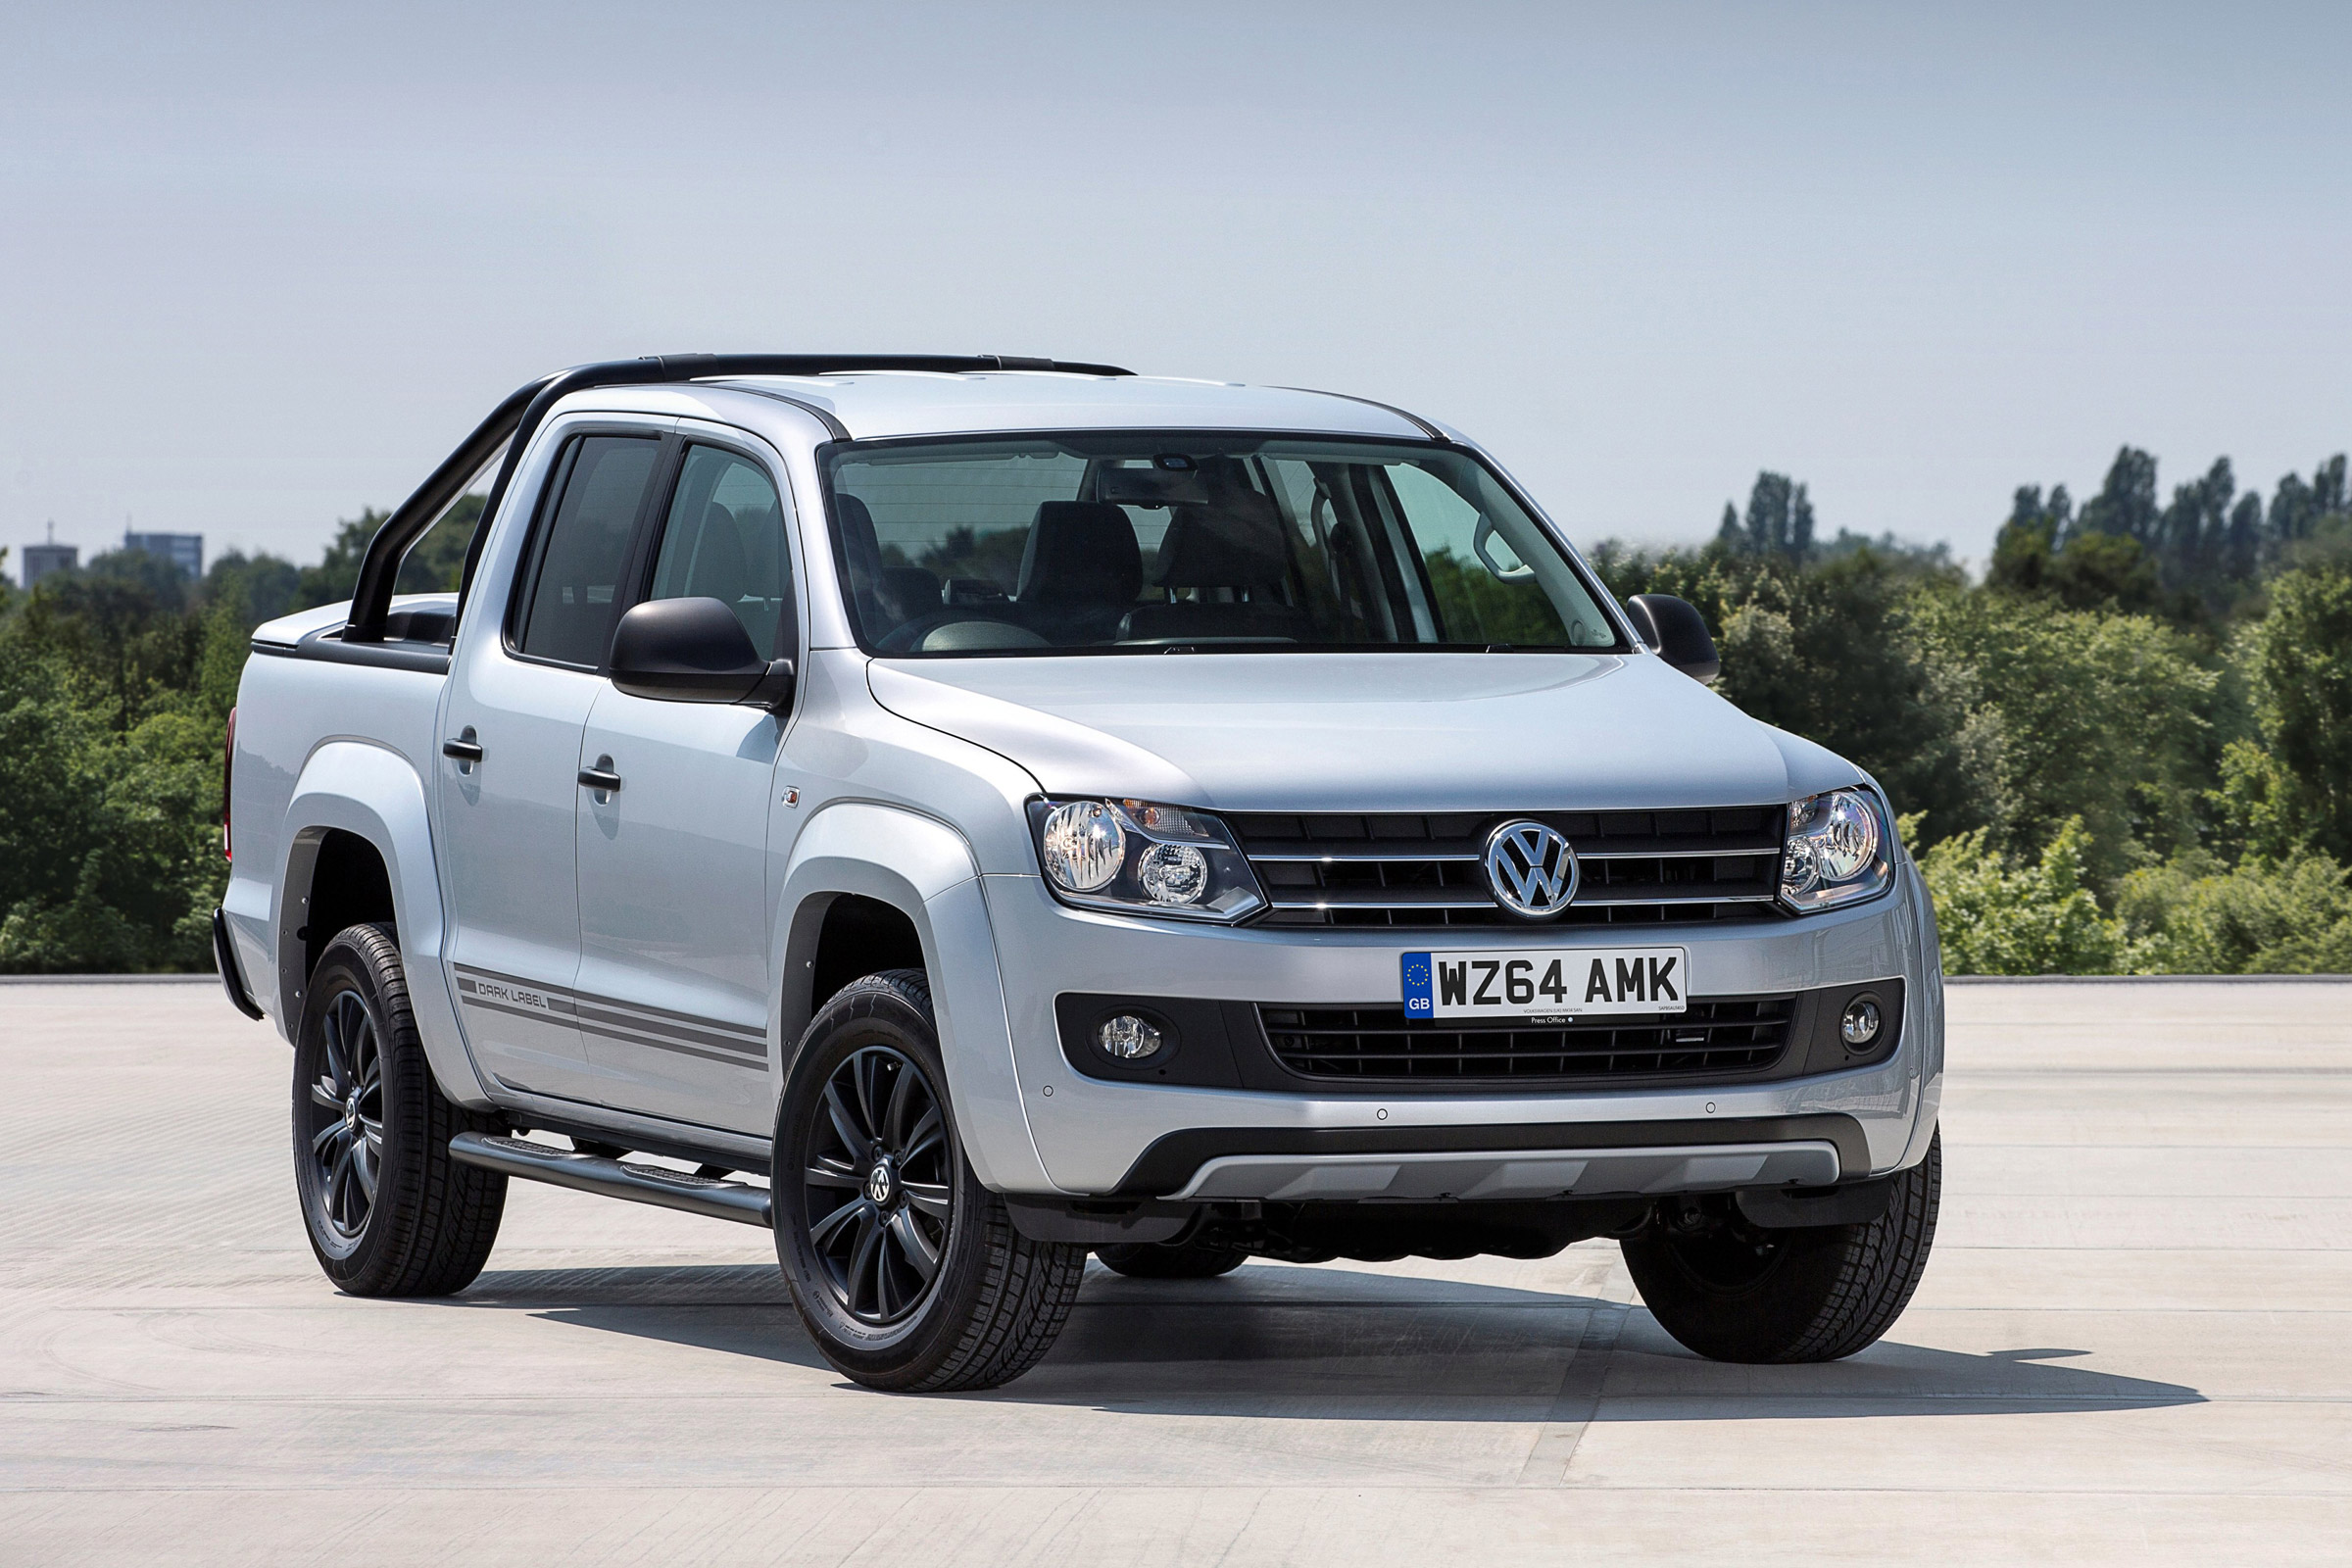 9 Inch Fender Flares Car Accessories Black Mudguard For Volkswagen